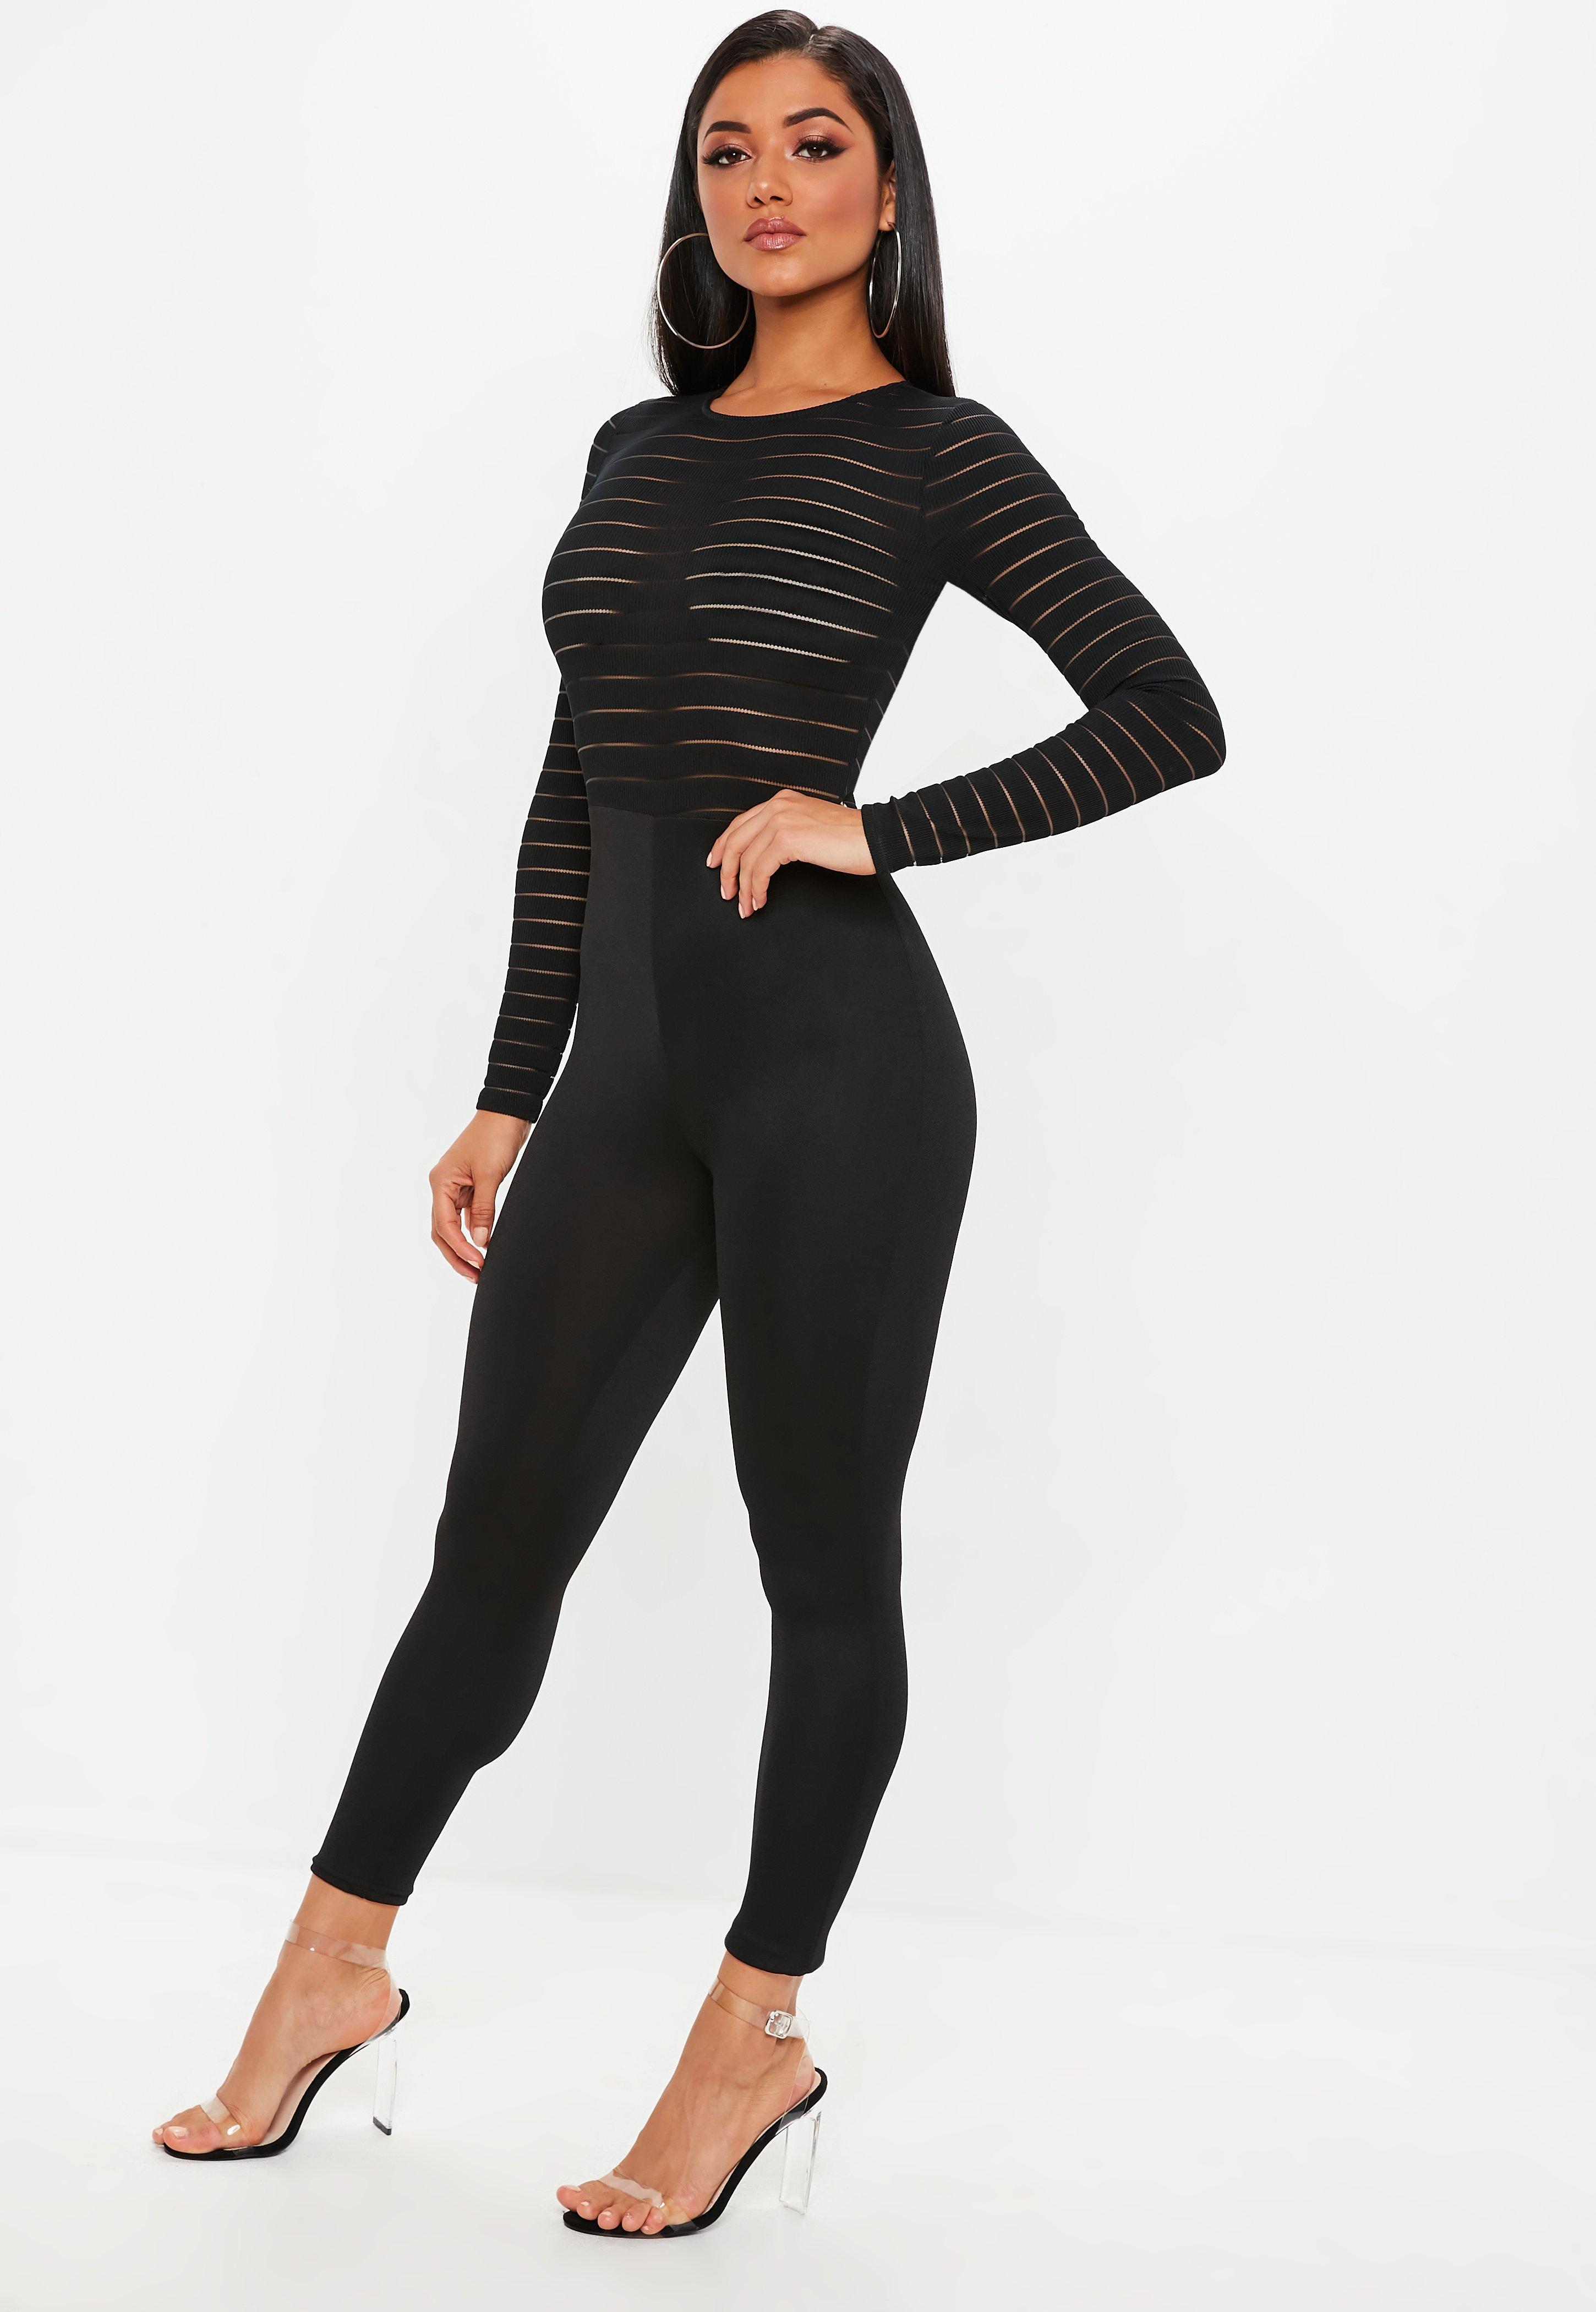 5d64f2bd6ef9 Missguided Black Burn Out Mesh Jumpsuit in Black - Lyst